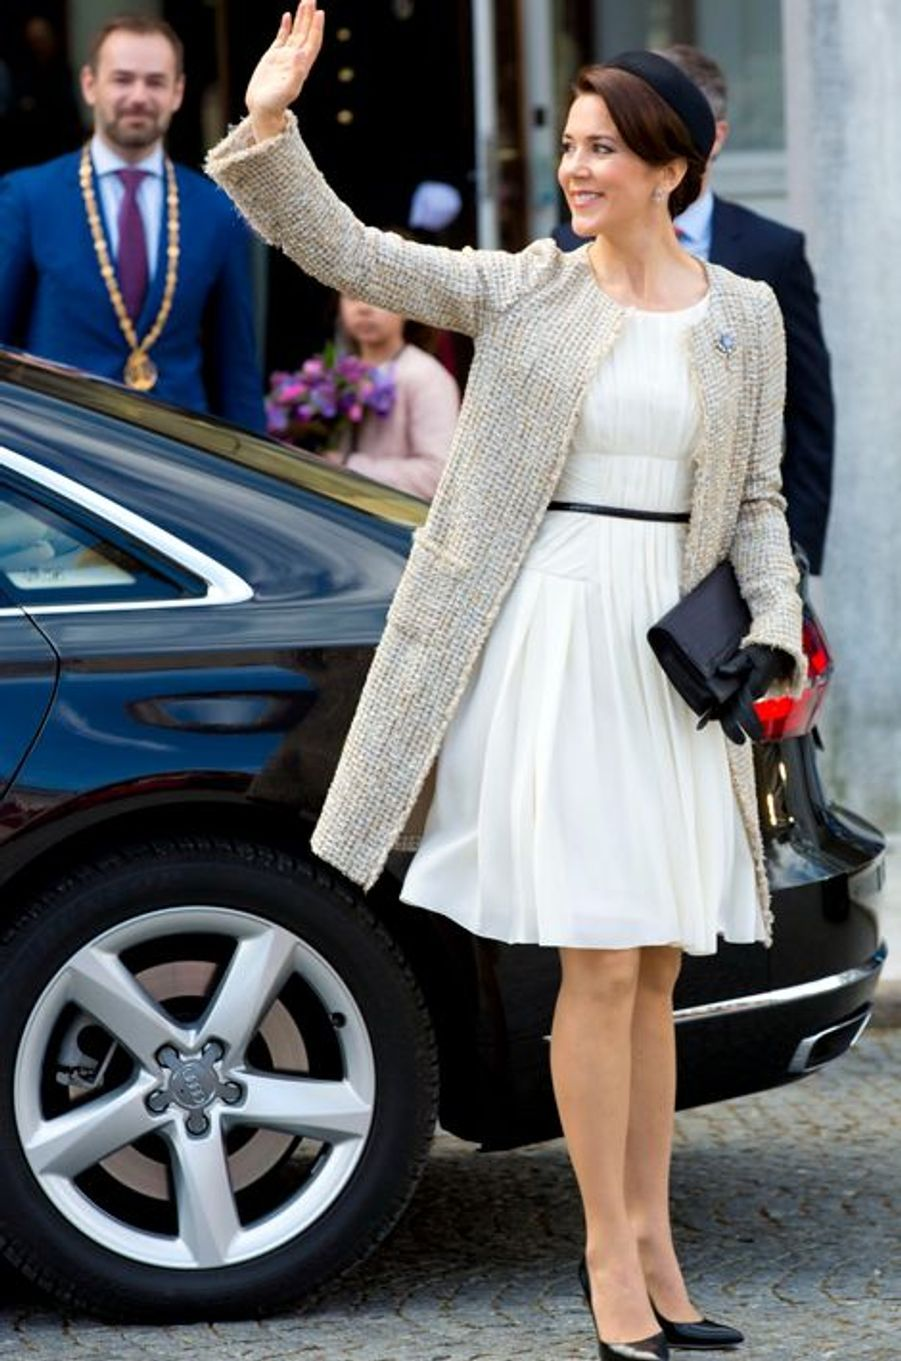 La princesse Mary de Danemark à Aarhus, le 8 avril 2015